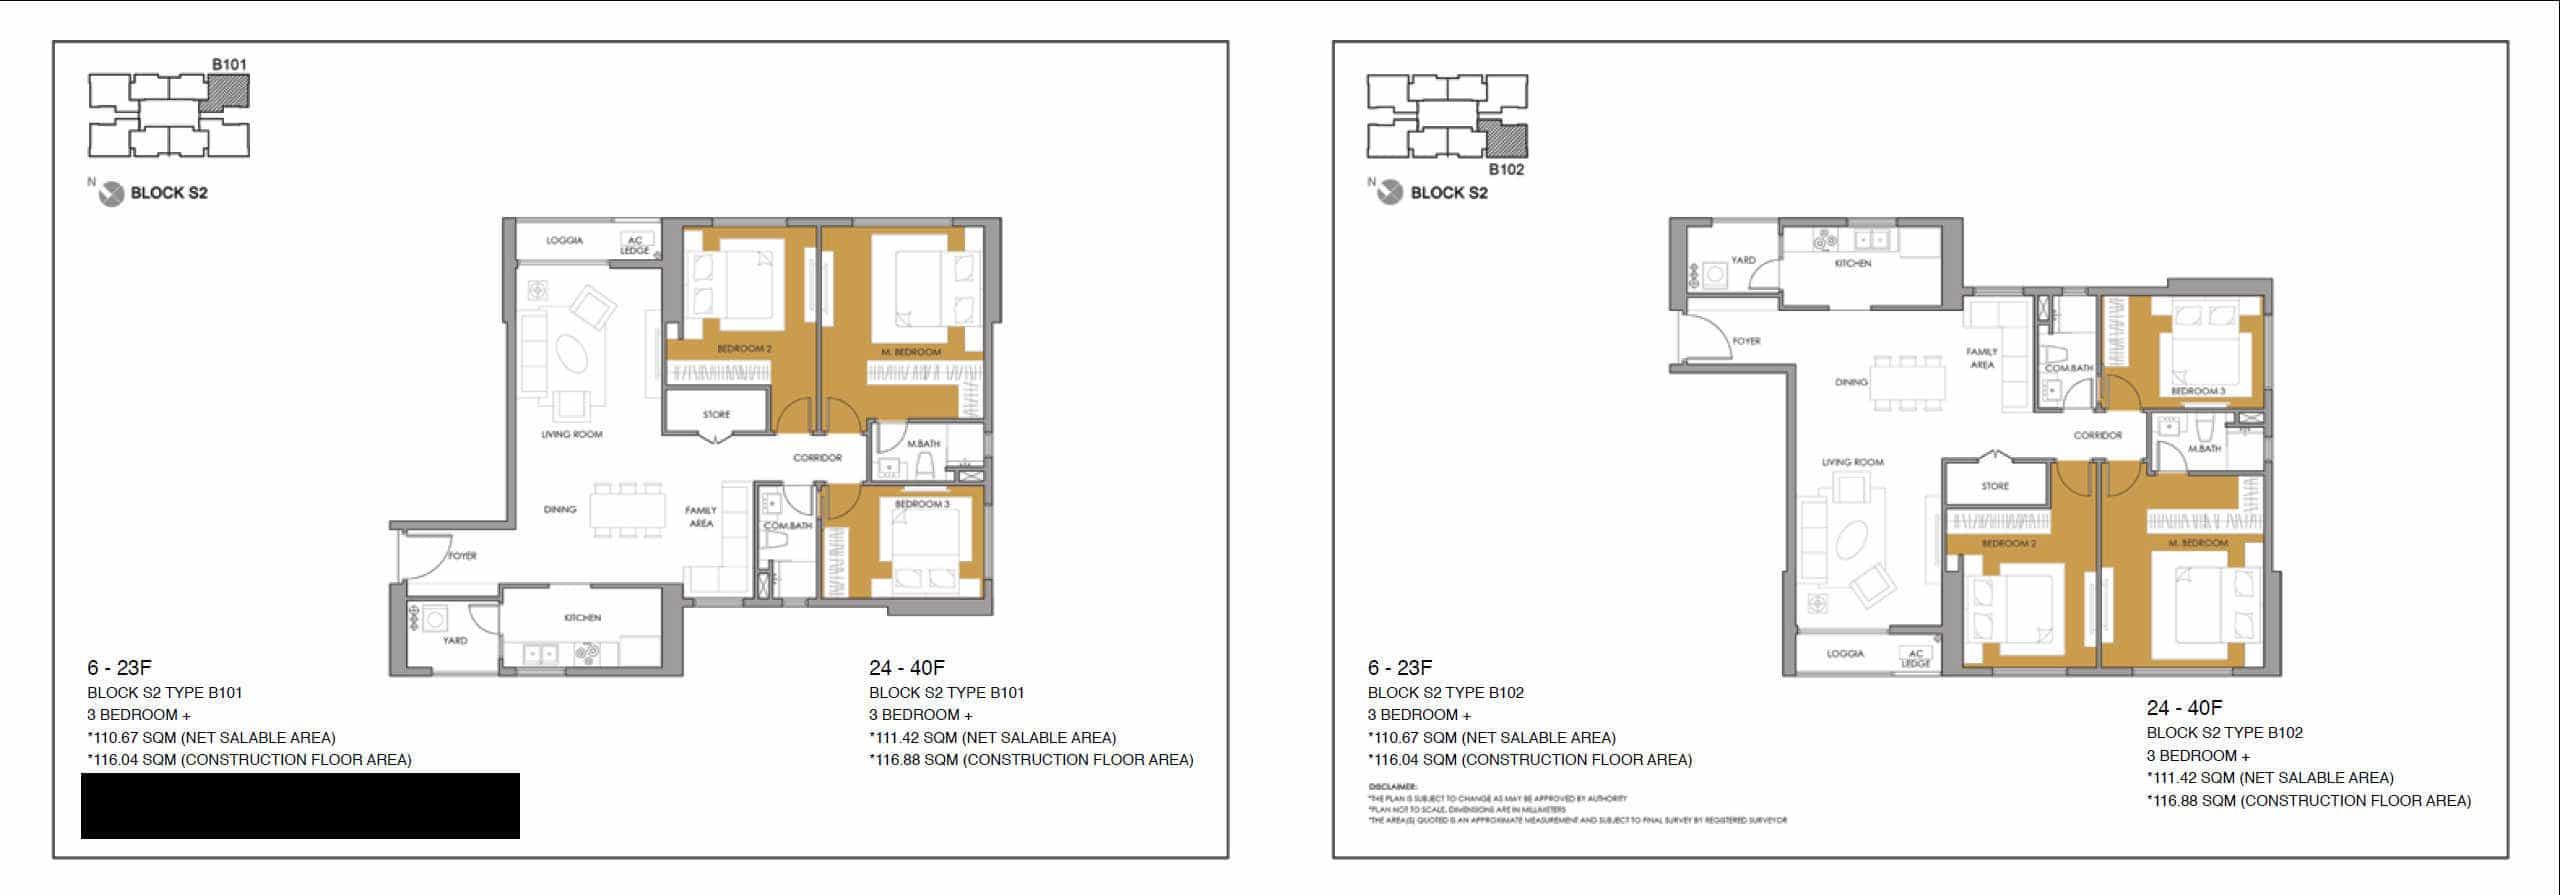 floor-plan-b101-102-1